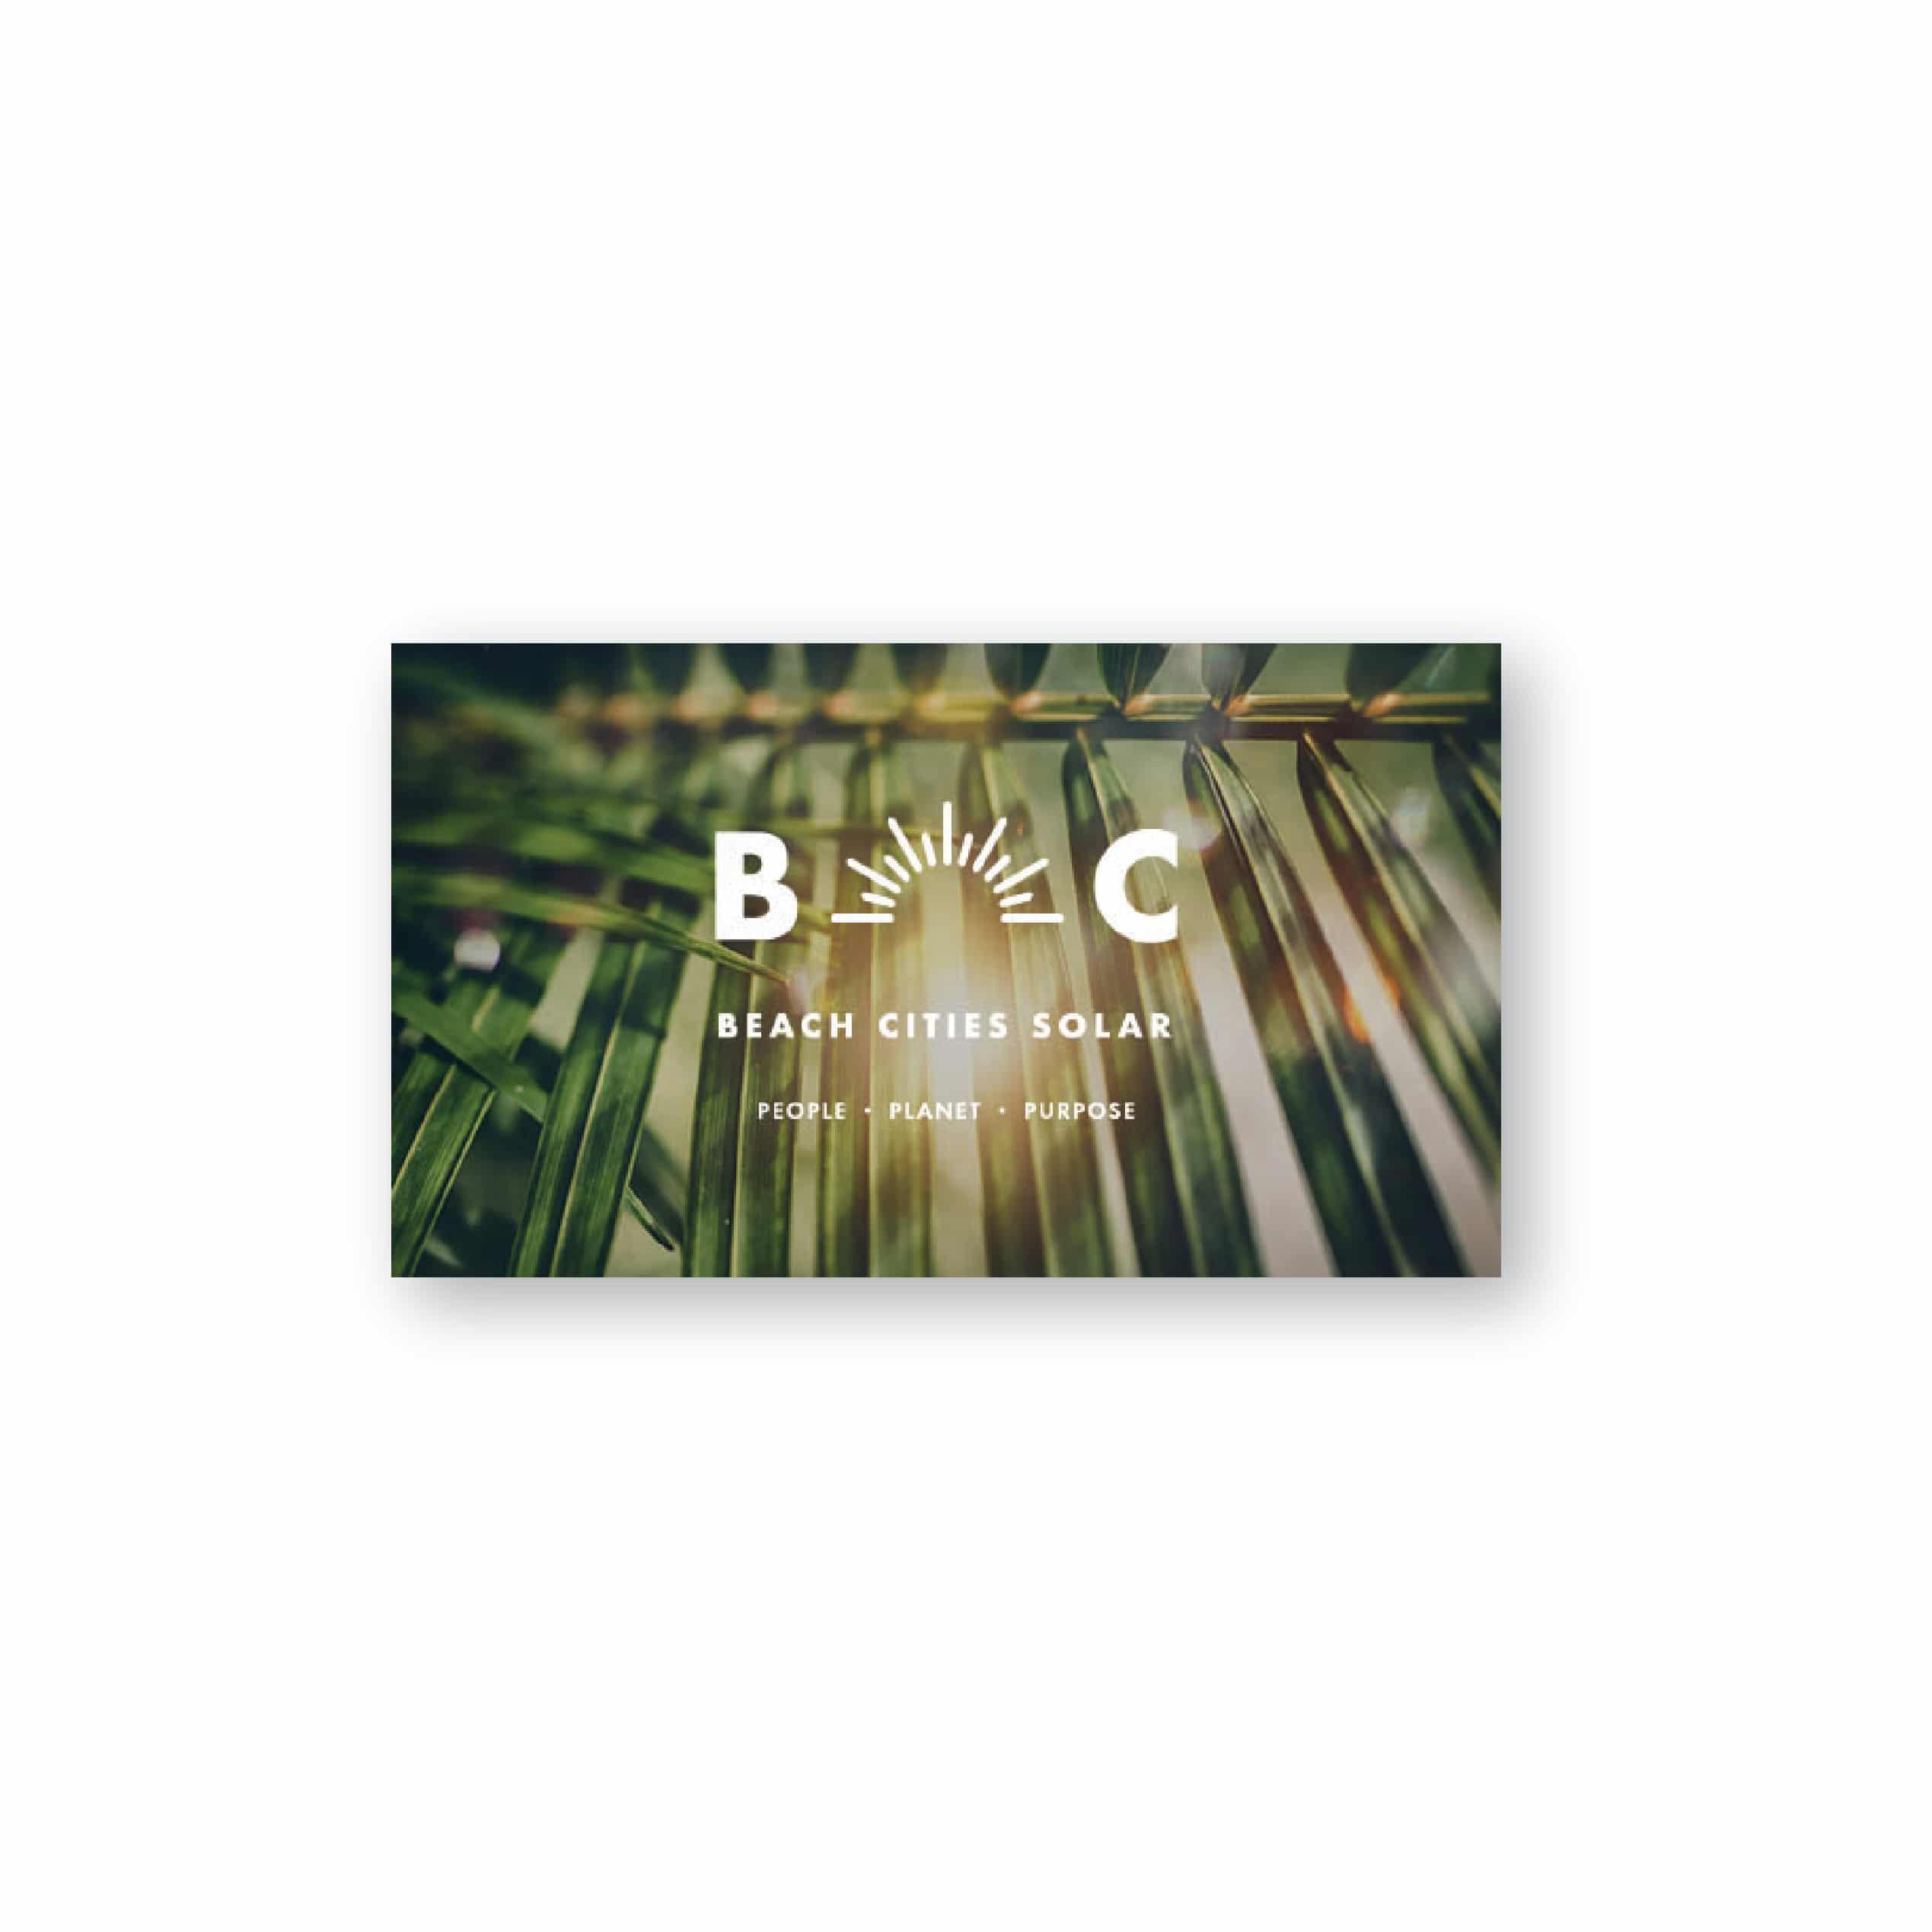 Beach_Cities_Solar_Logos_By_Stellen_Design_Profile-02